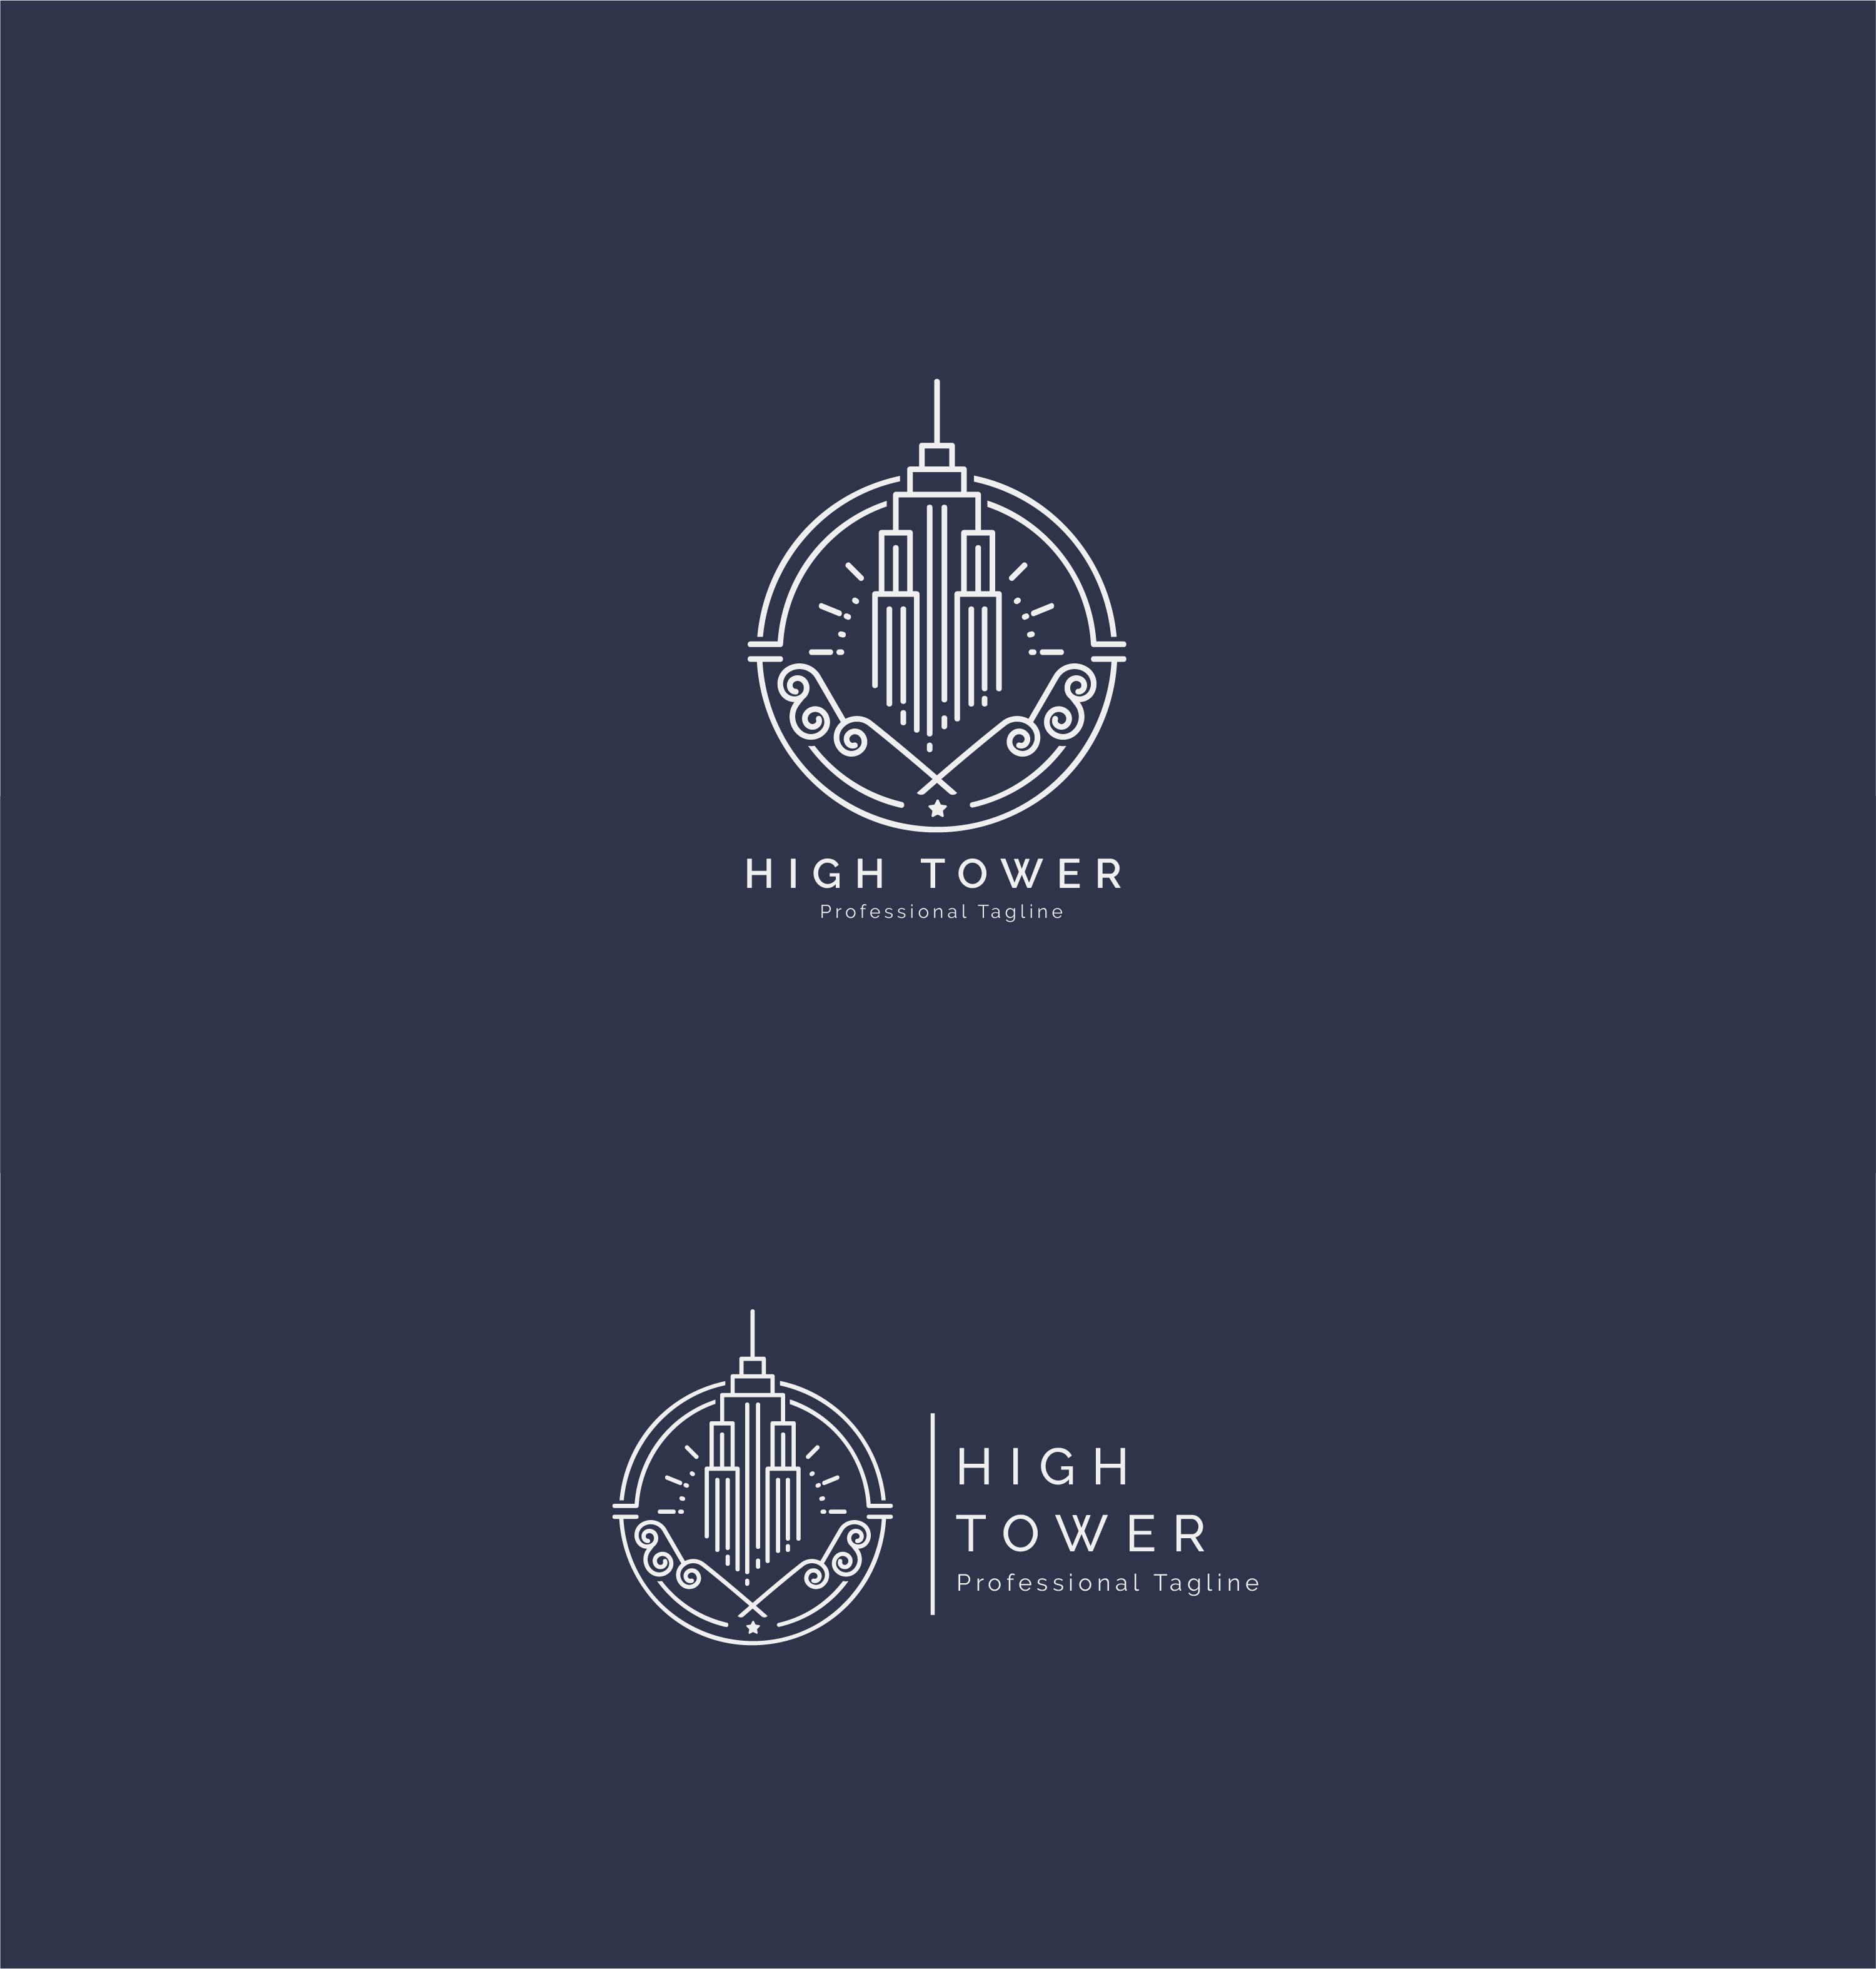 High Tower Logo - Construction Building Logo example image 2